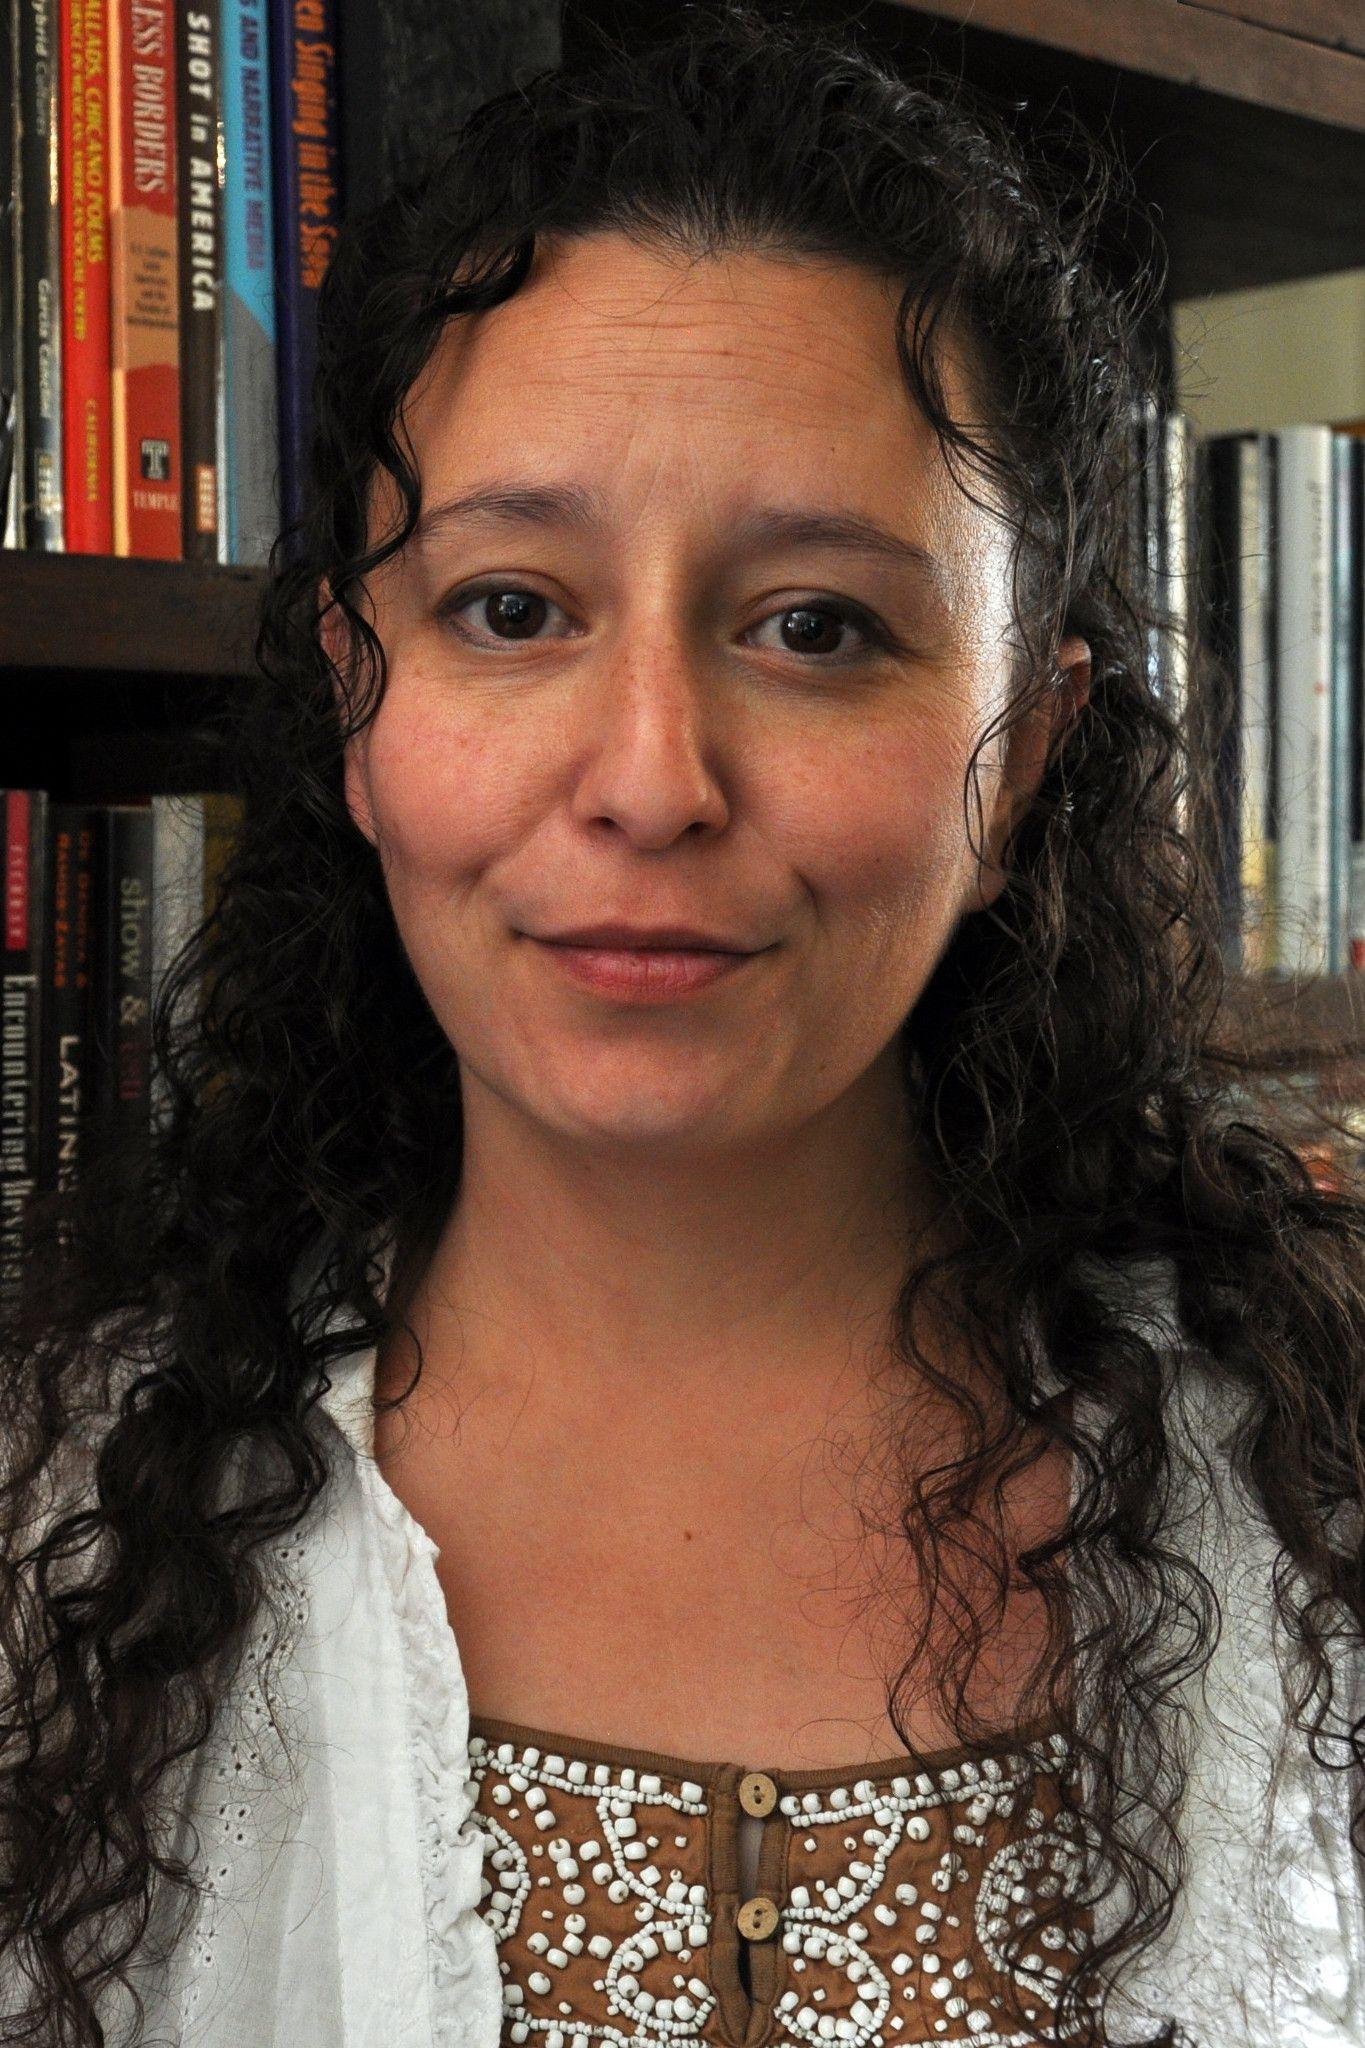 Kristy Ulibarri